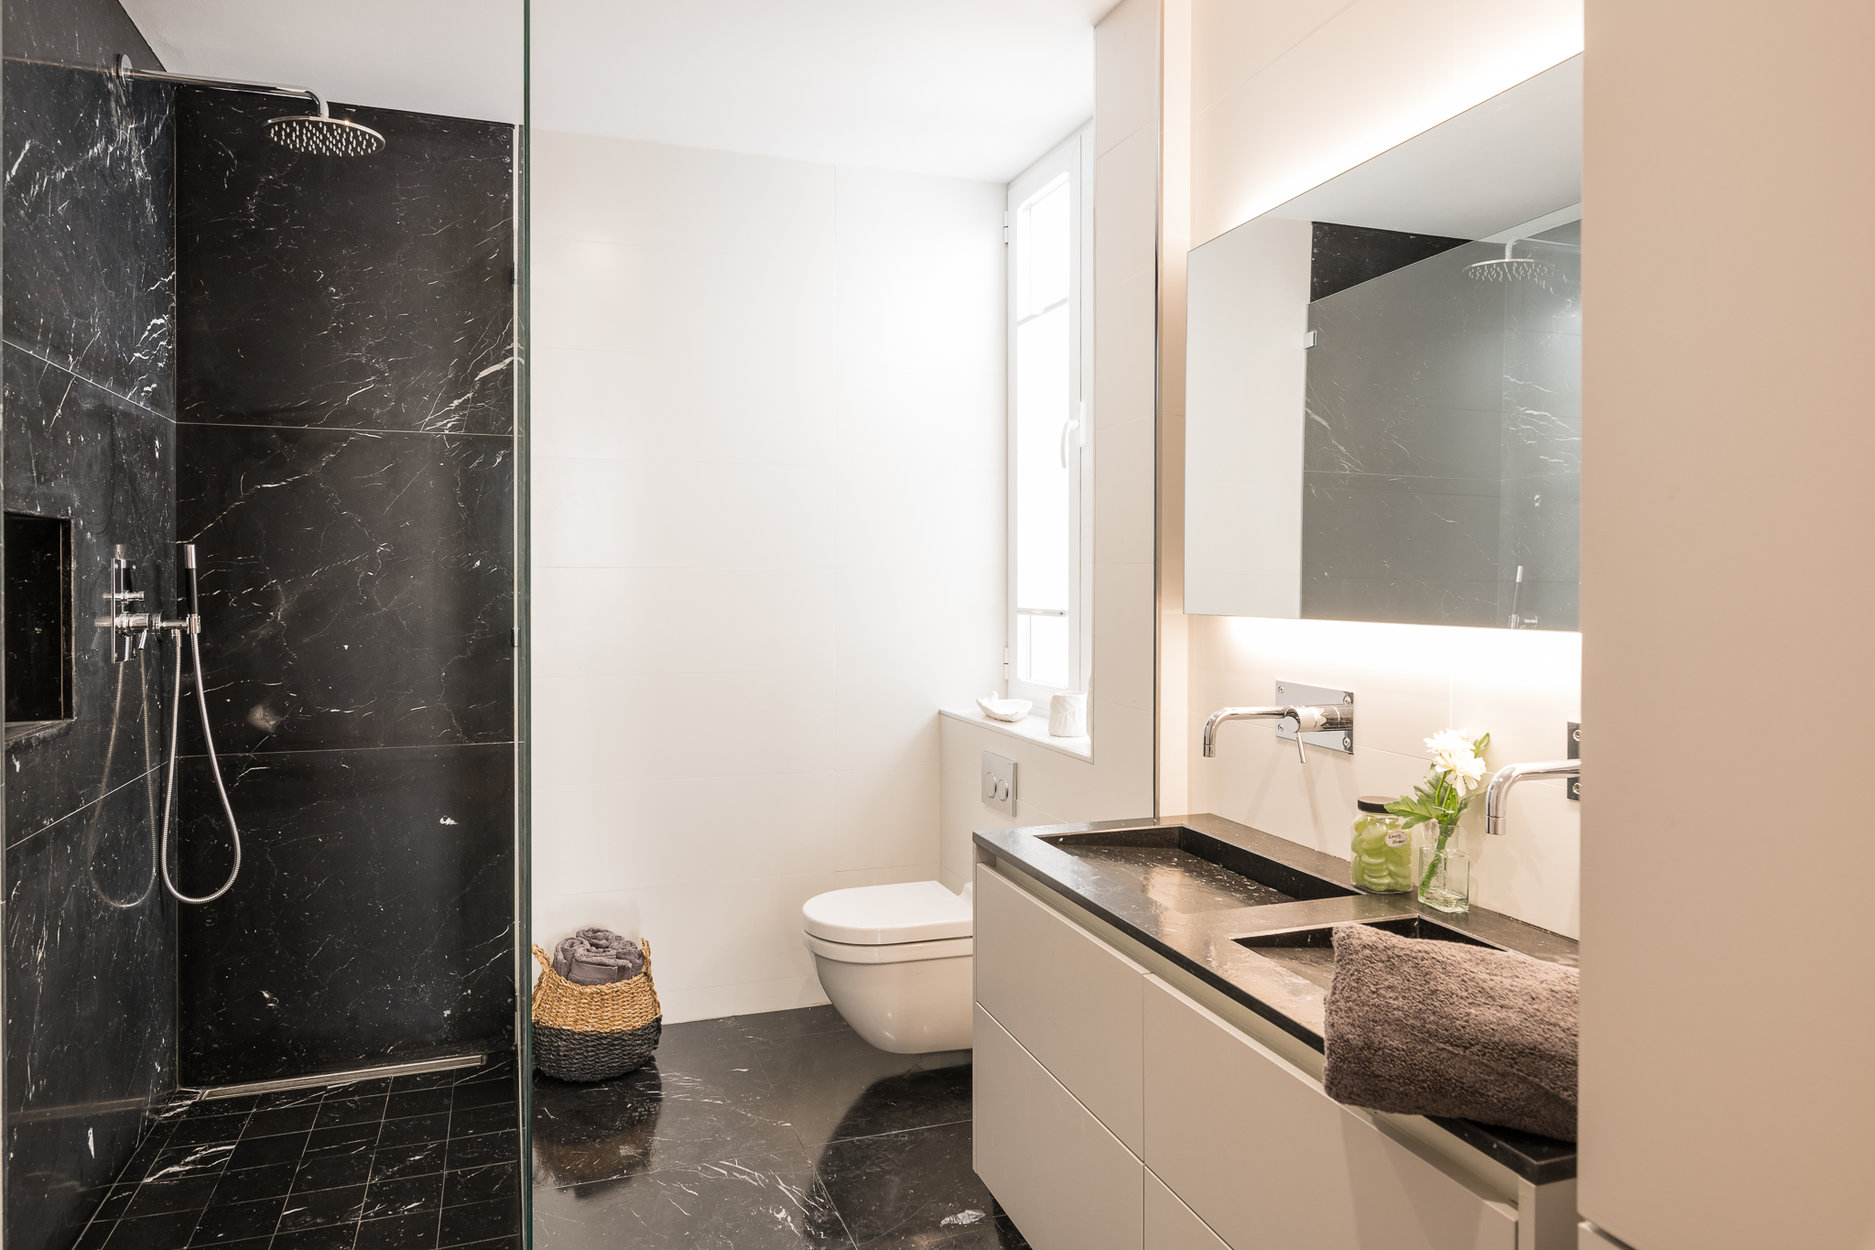 Bathroom Design Center 3 Bathroom Design Modern \\u0026 Loft - 3D ...